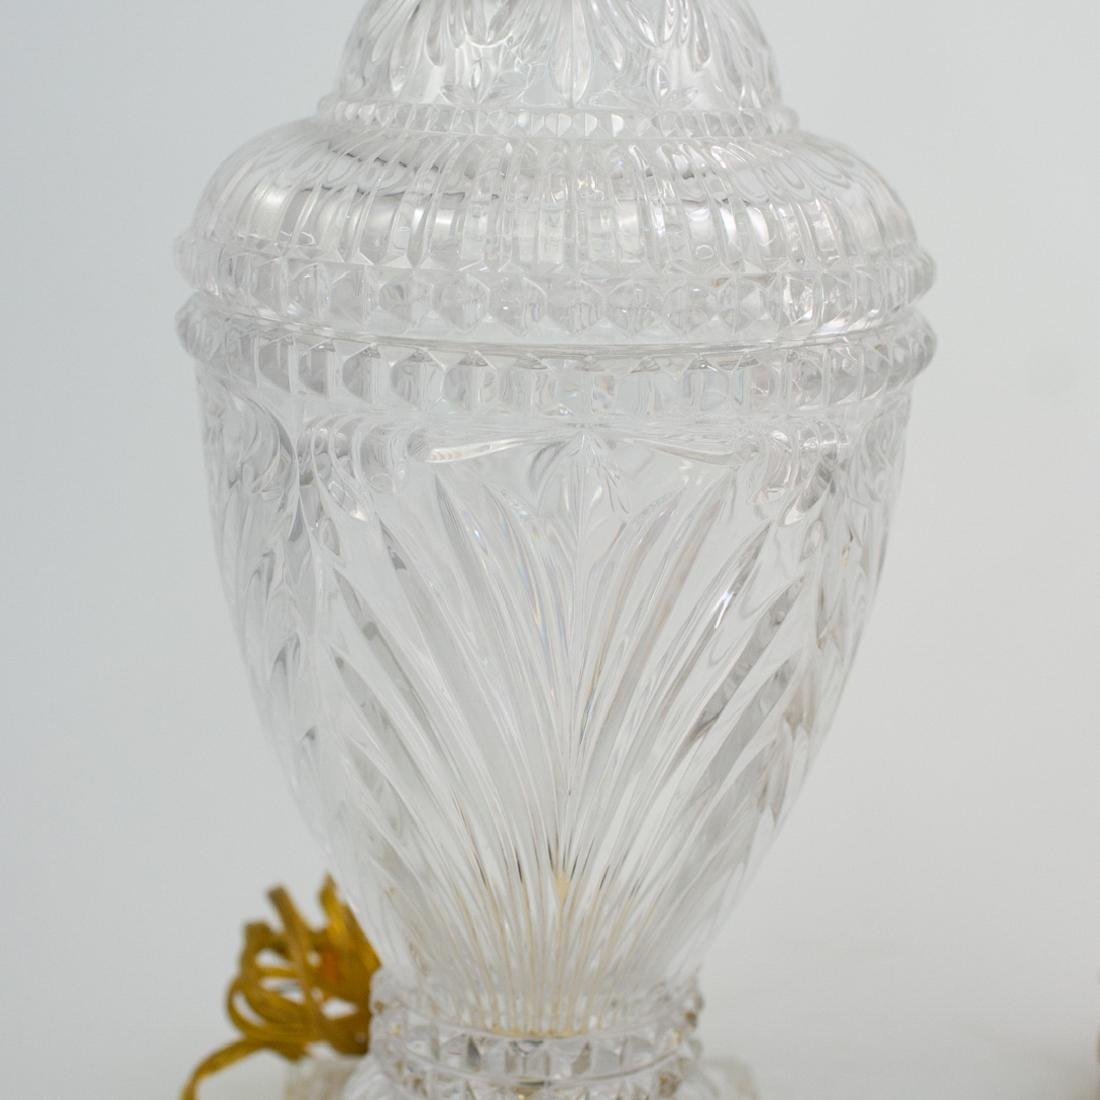 Pair of Cut Crystal Urn Lamps - 5